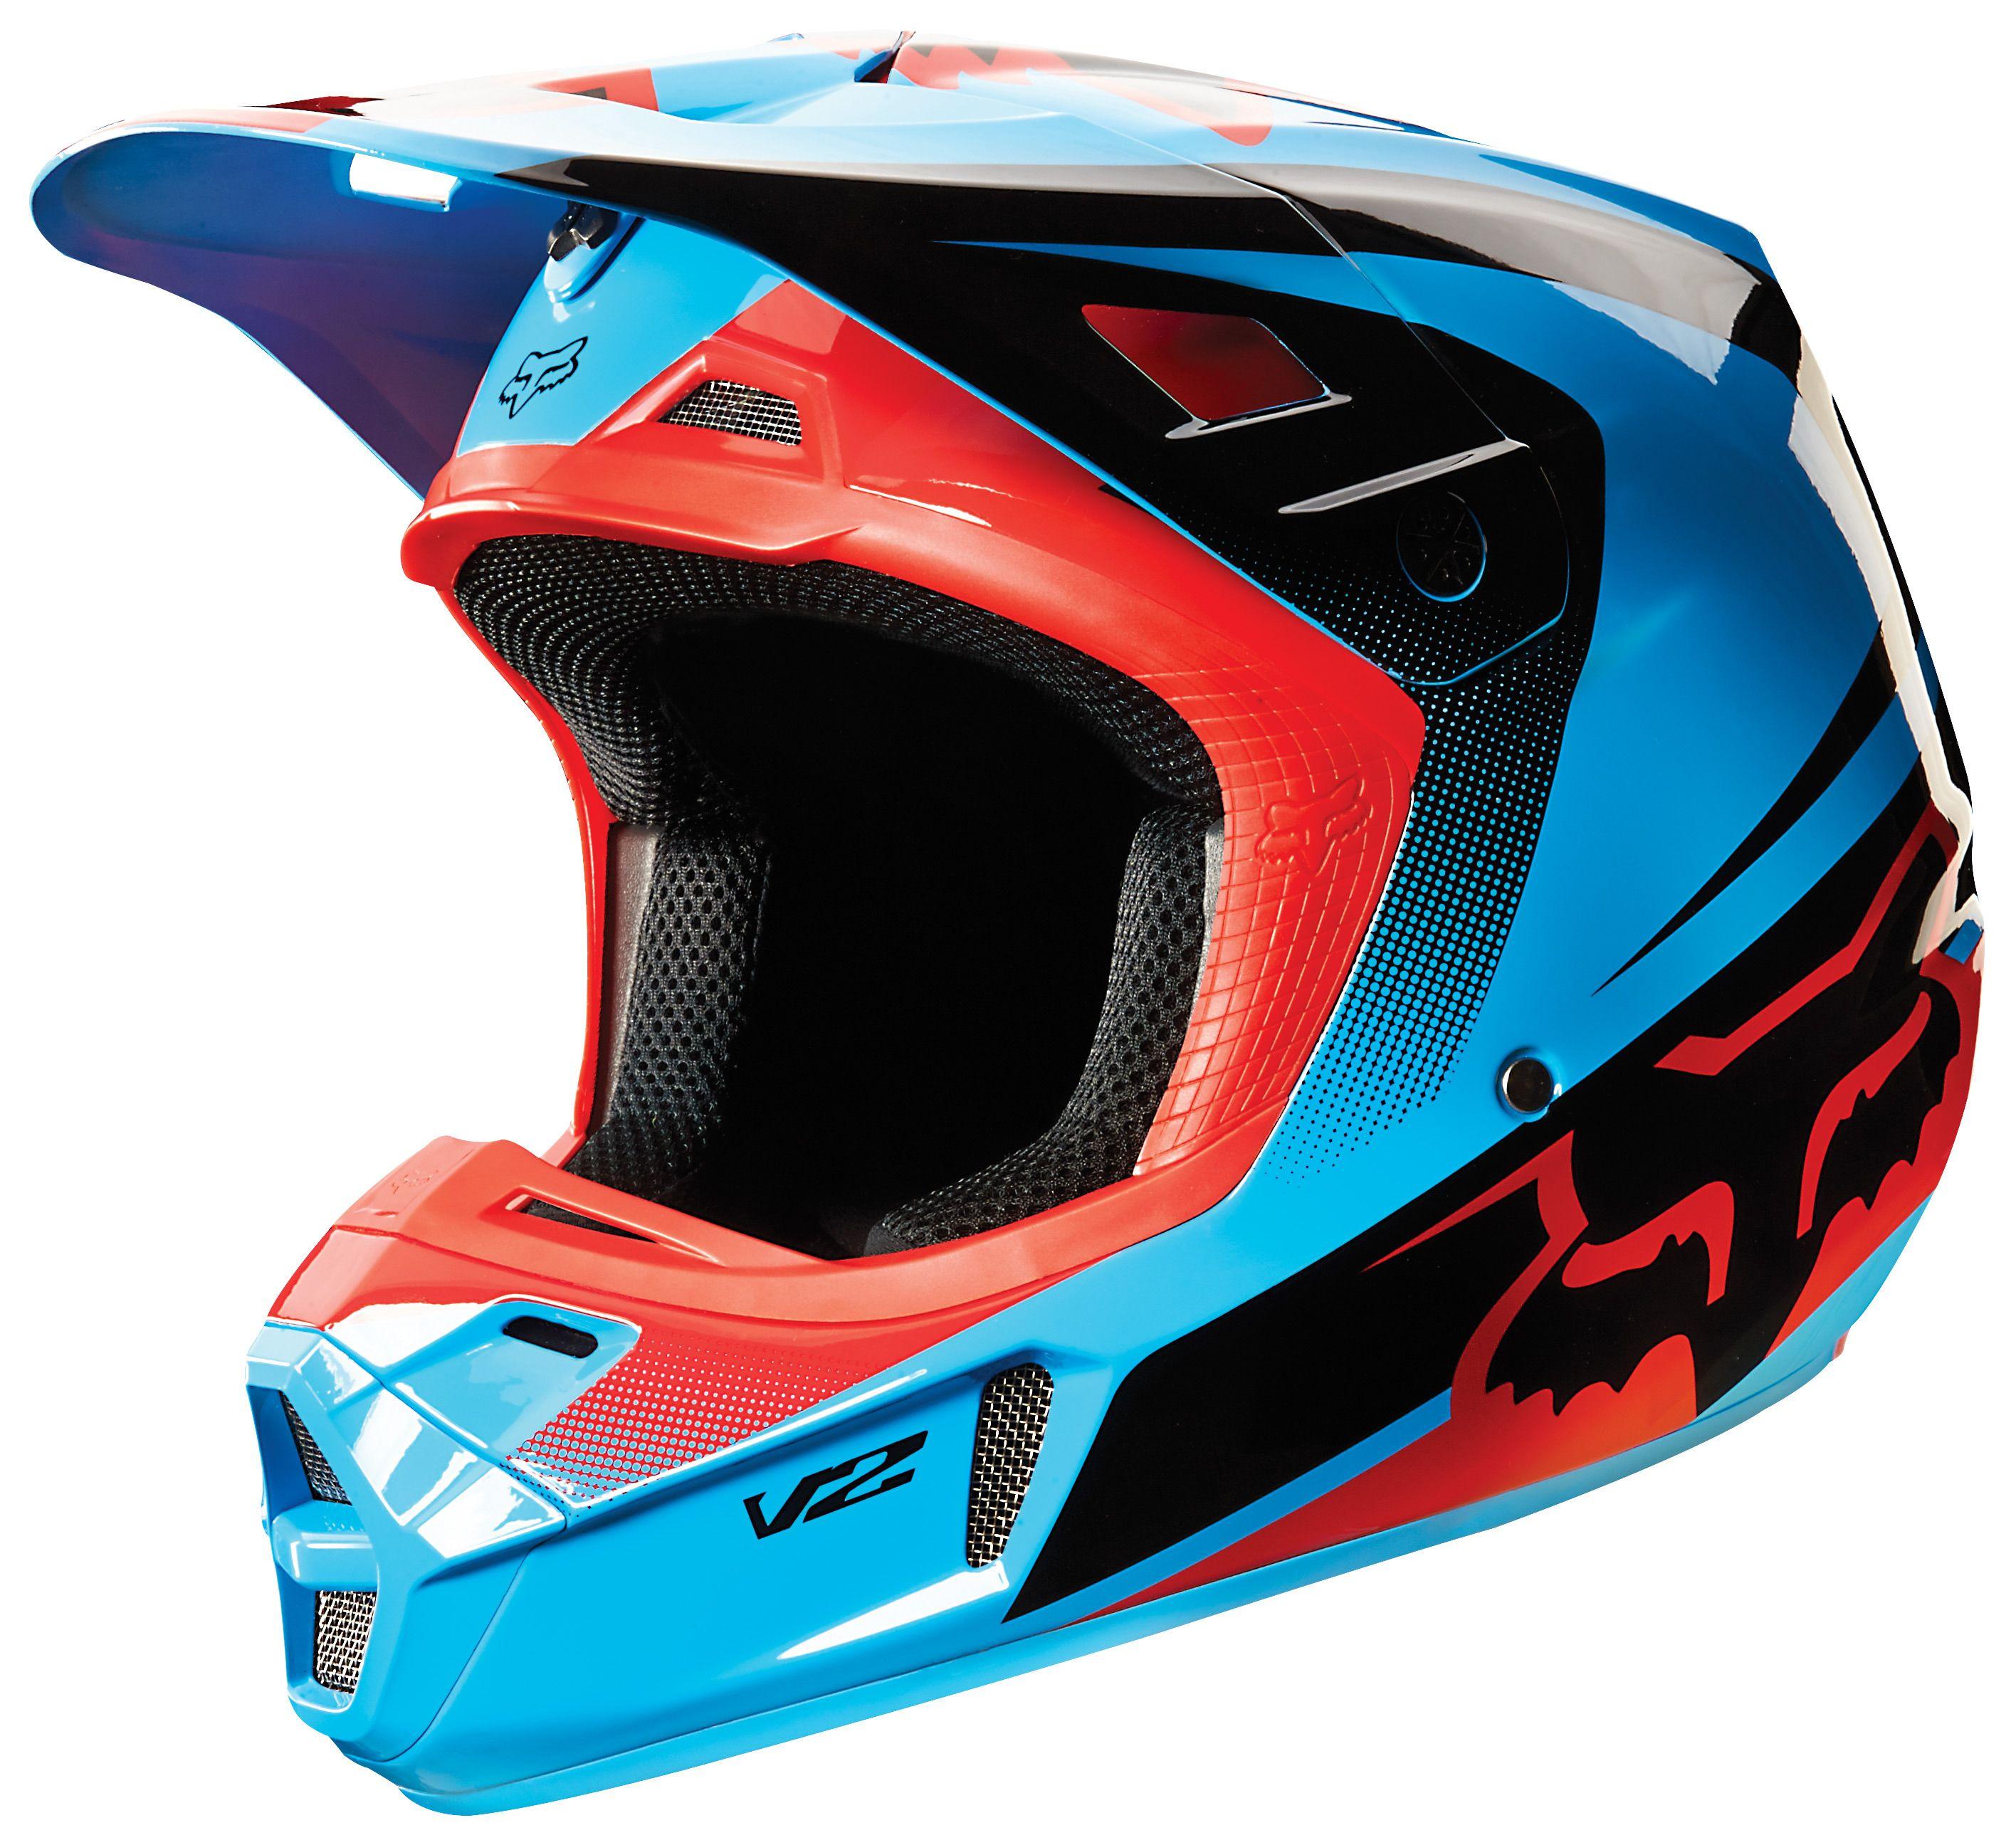 fox racing v2 imperial helmet revzilla. Black Bedroom Furniture Sets. Home Design Ideas